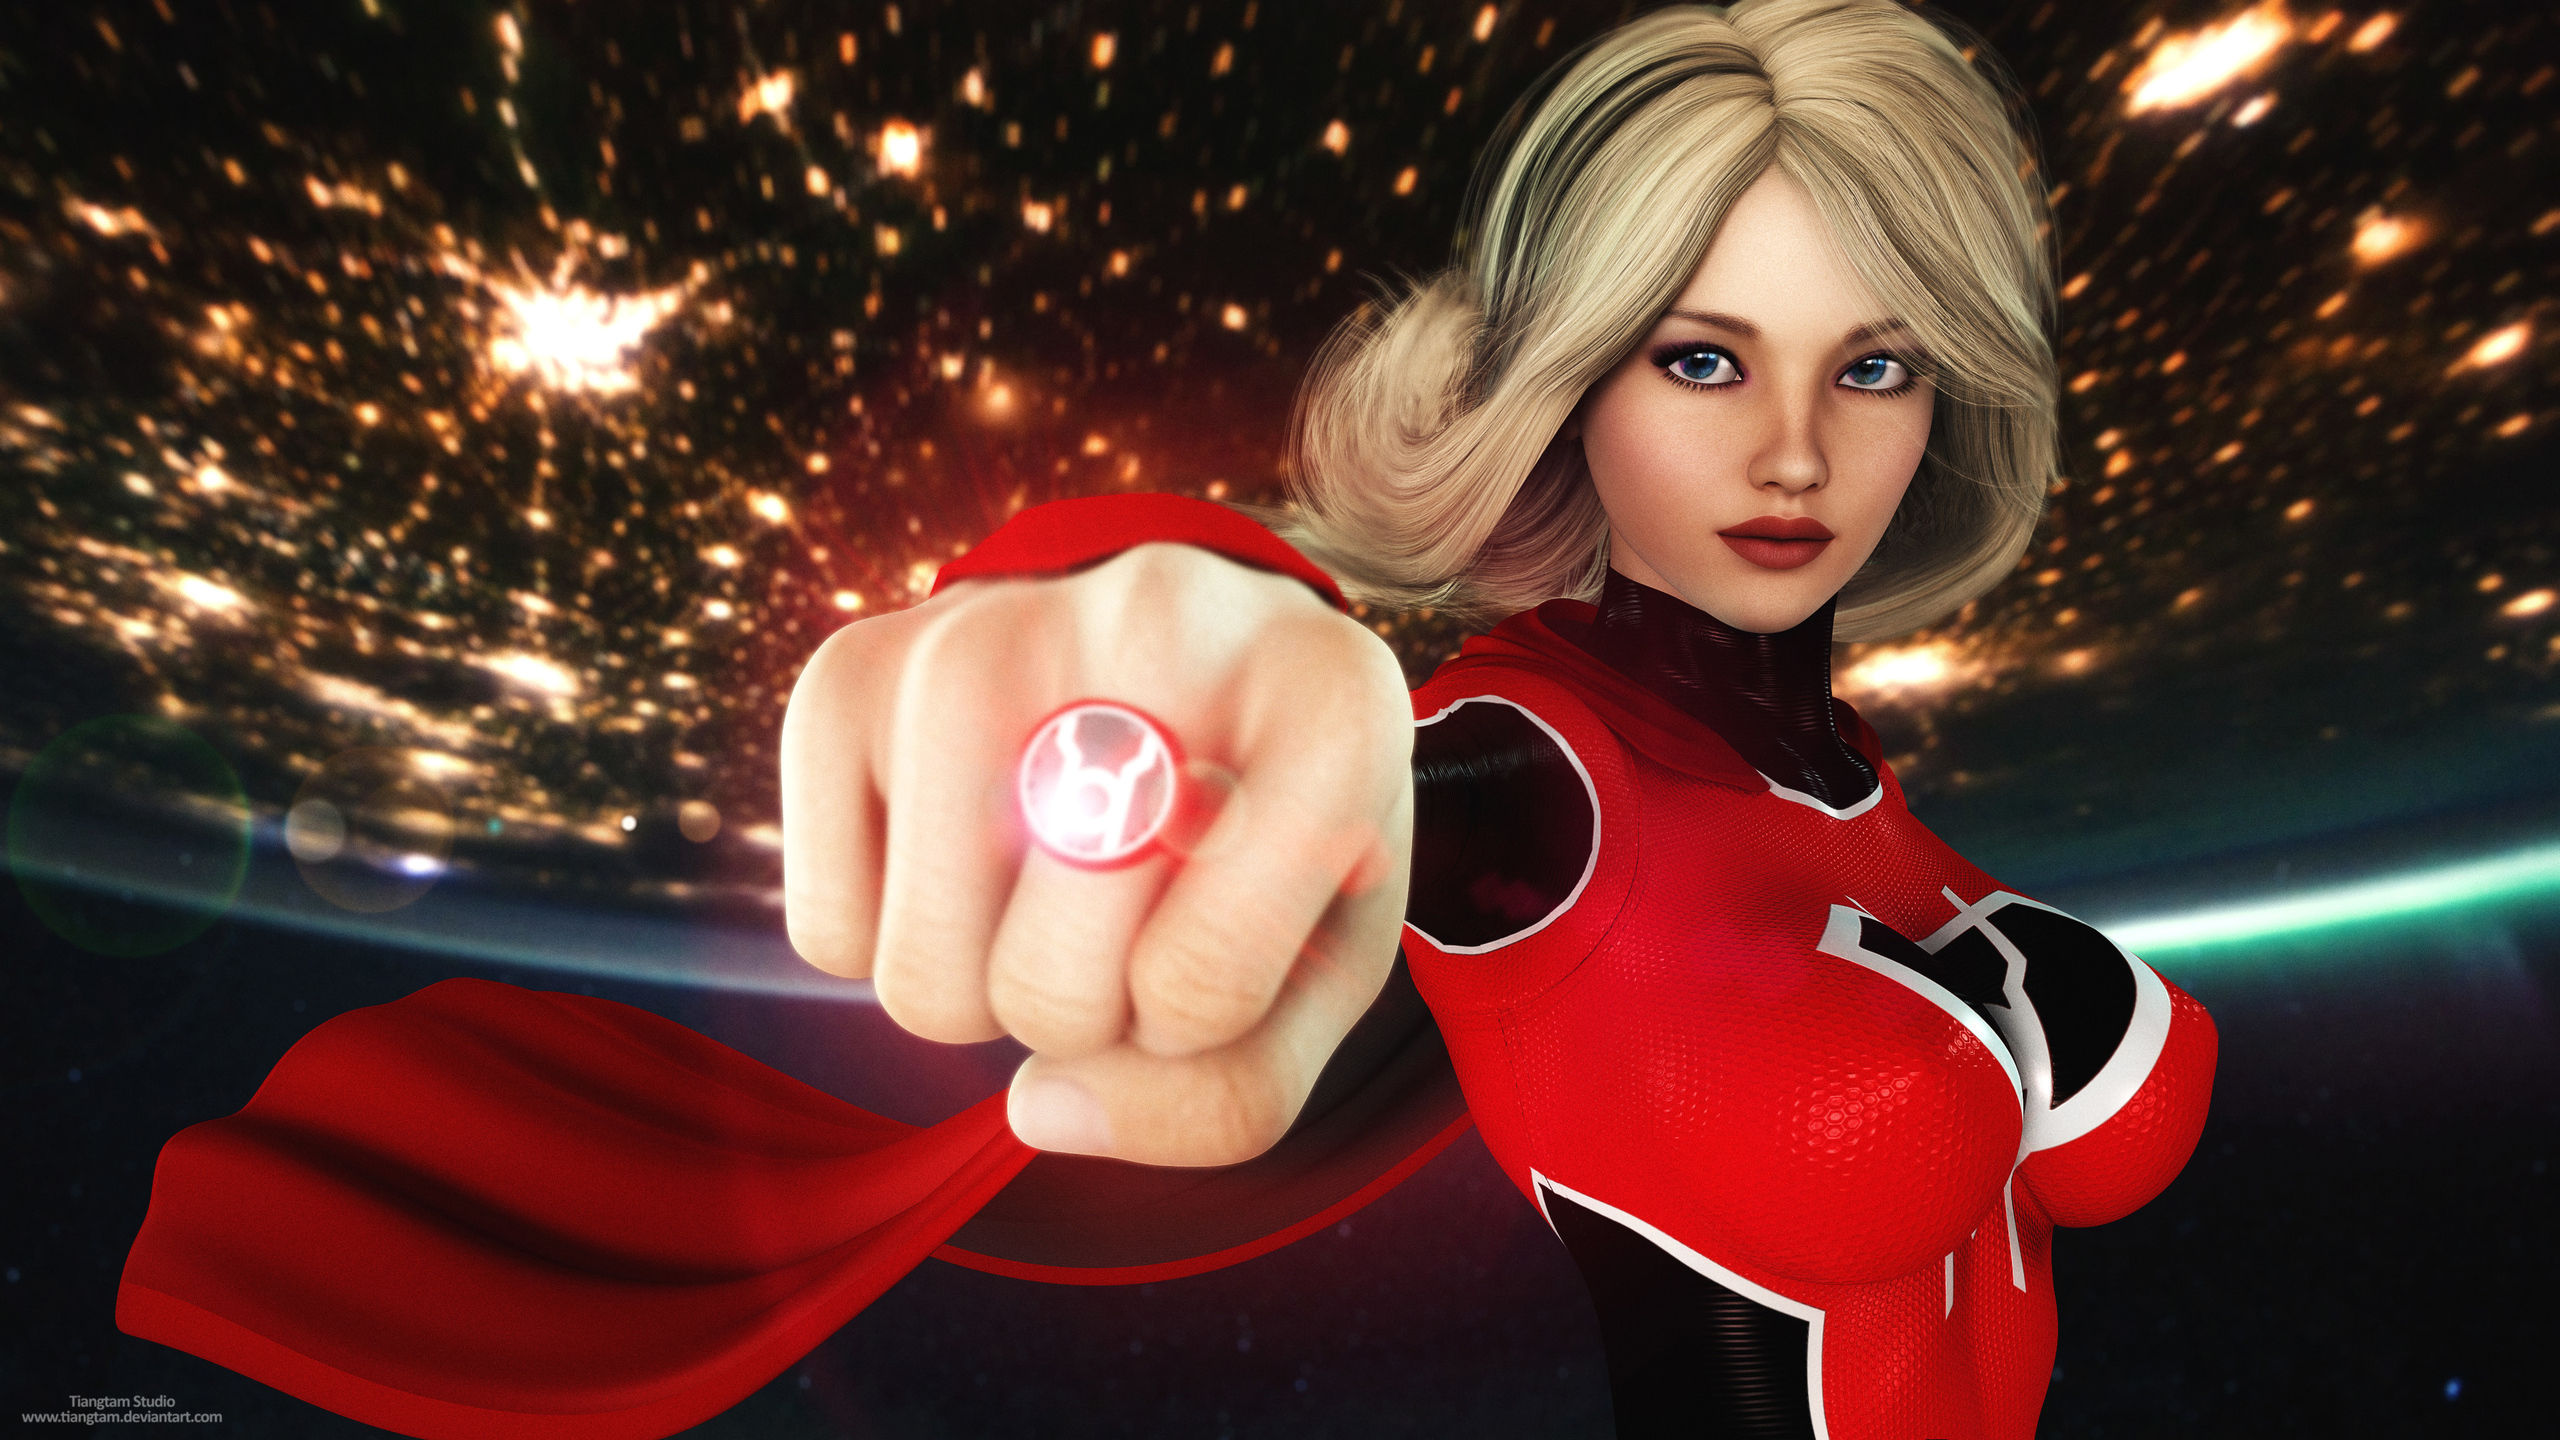 2560x1440 Red Lantern Supergirl 4k 1440p Resolution Hd 4k